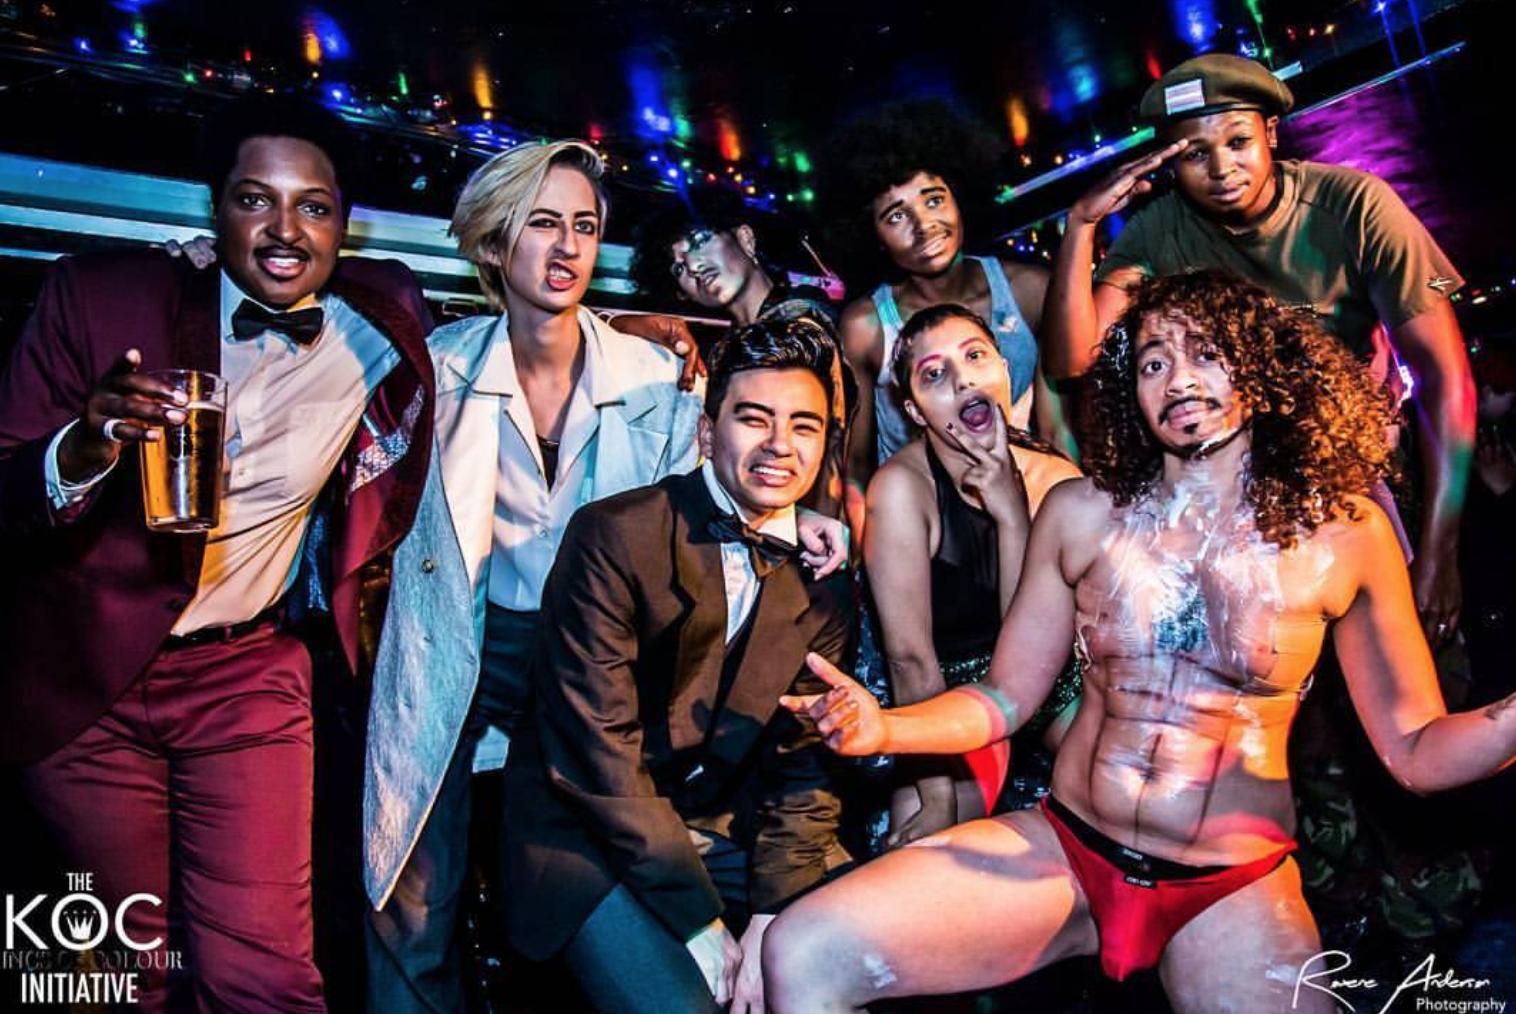 Meet Kings of Colour , the drag kings taking on London